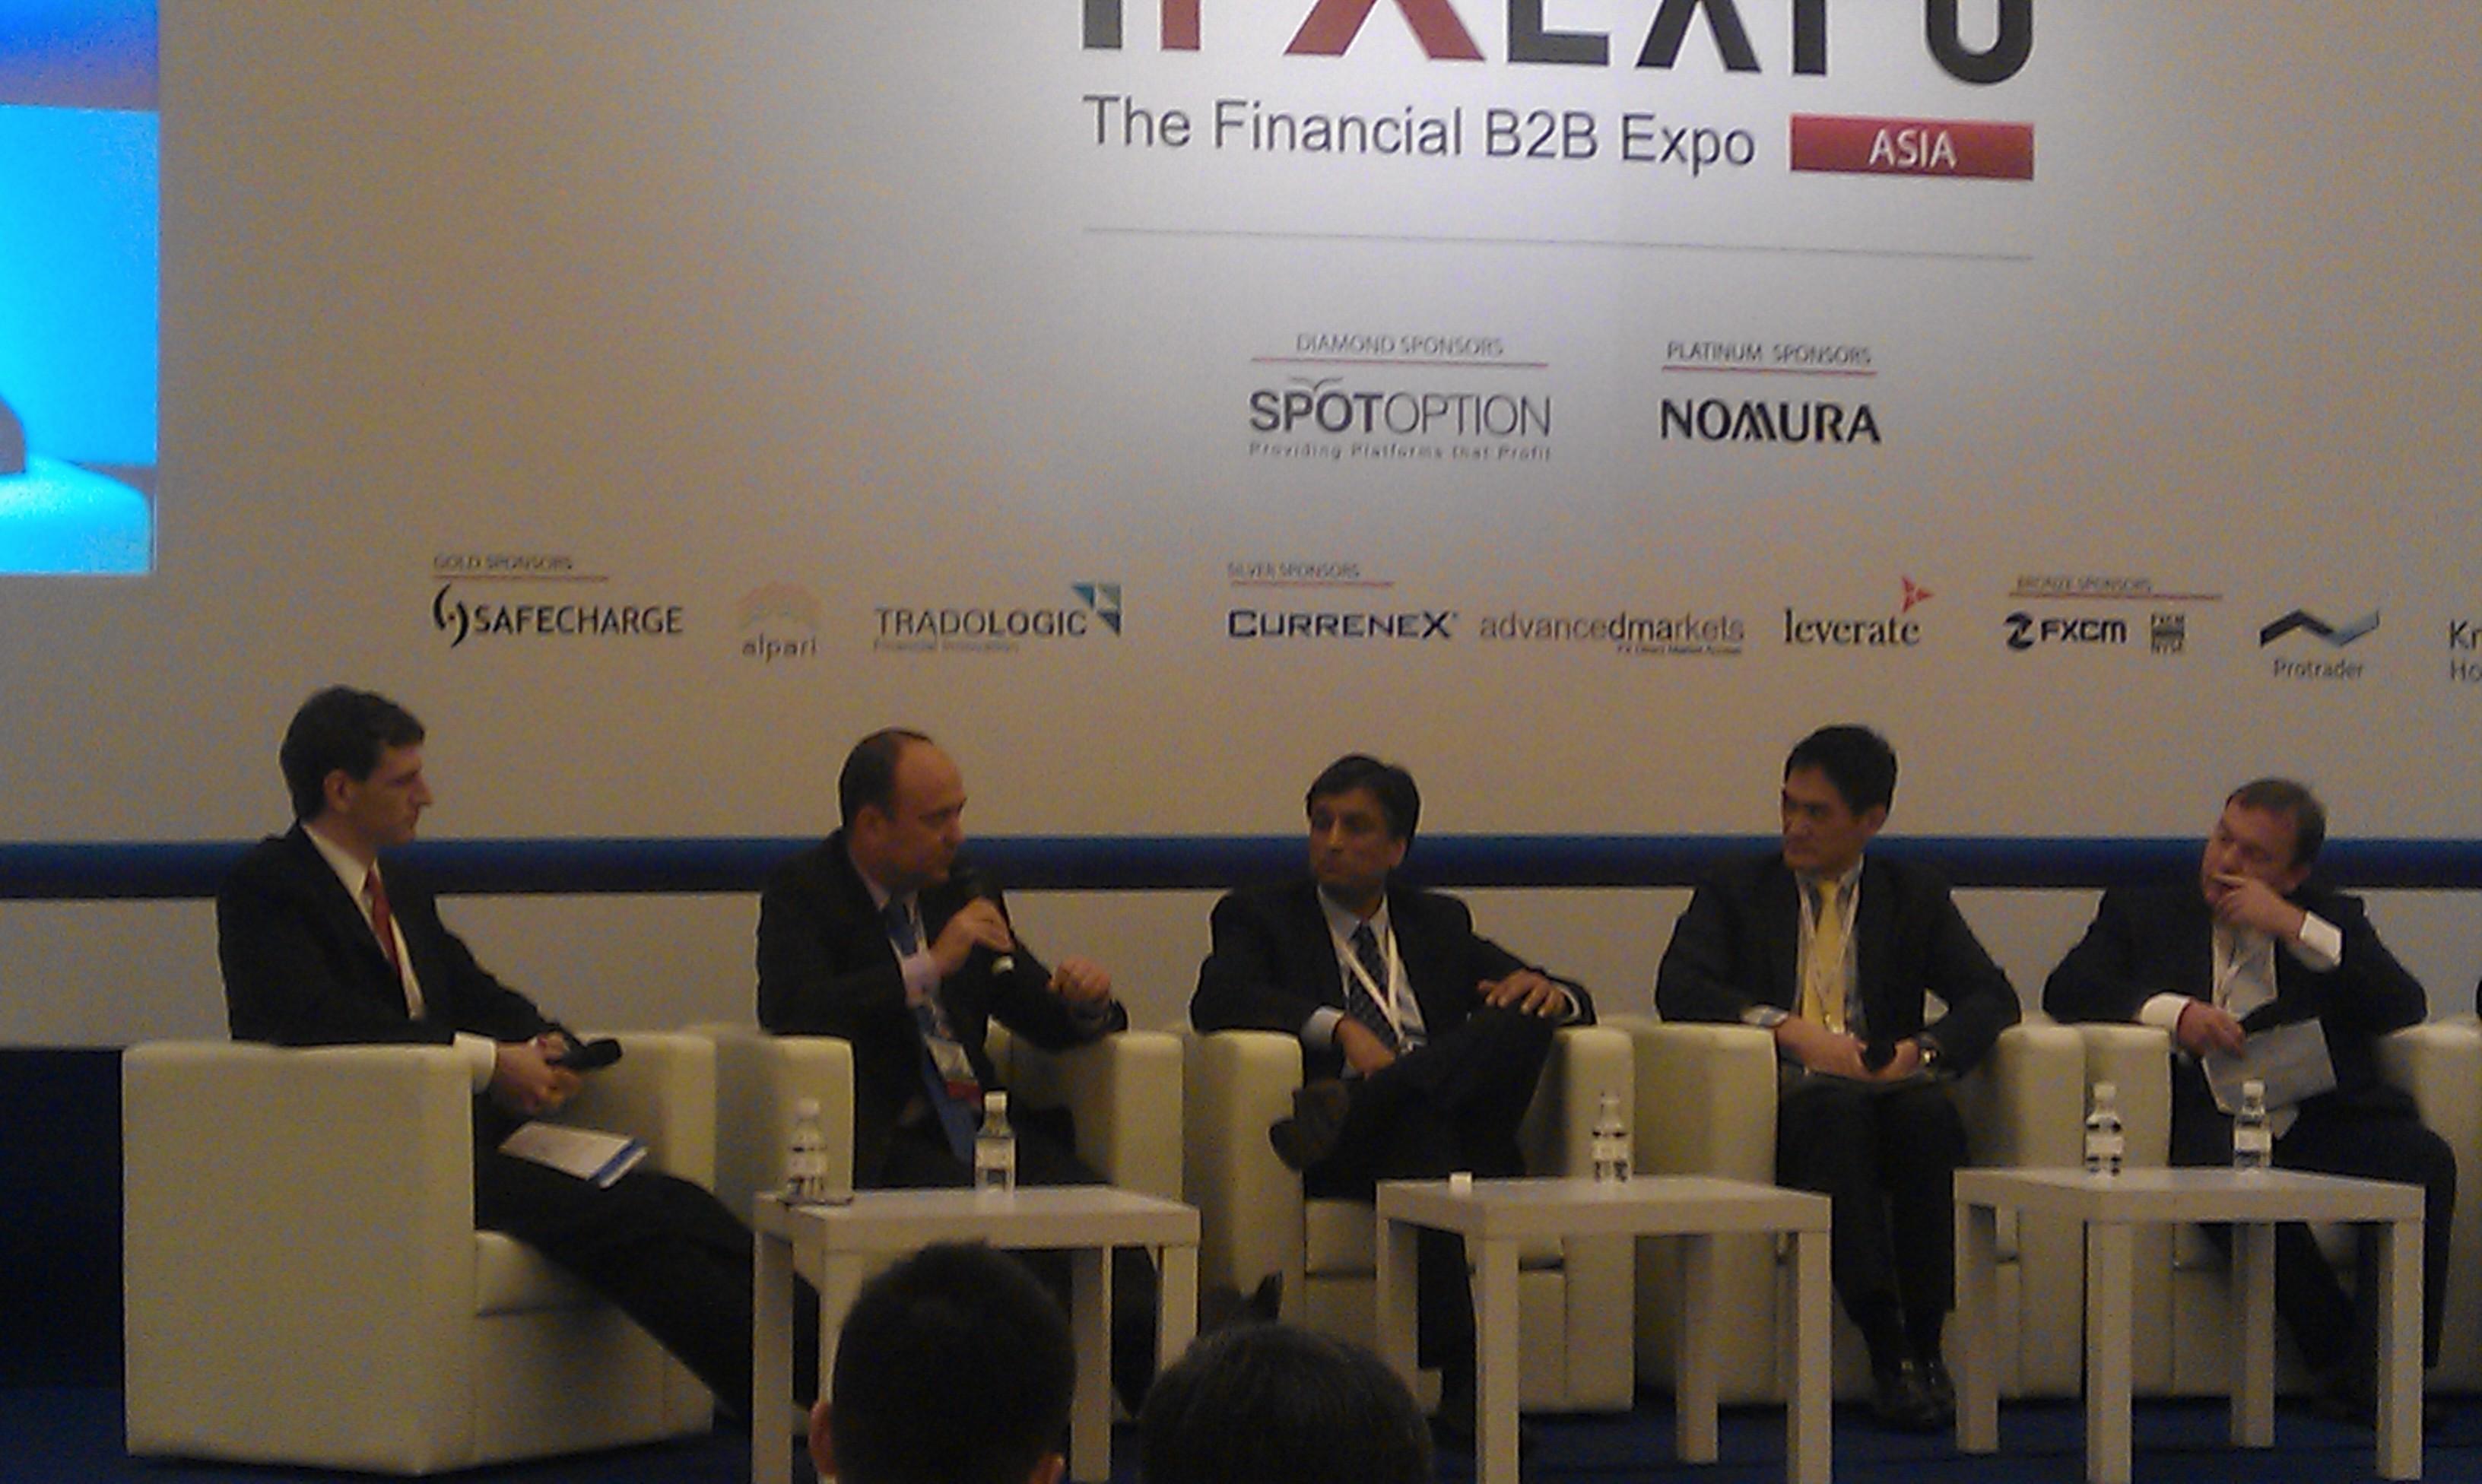 Liquidity Panel: Speakers Rob Fleschler, Alex Knight, Stephen Lynch, Darren Jer & Jon Barker